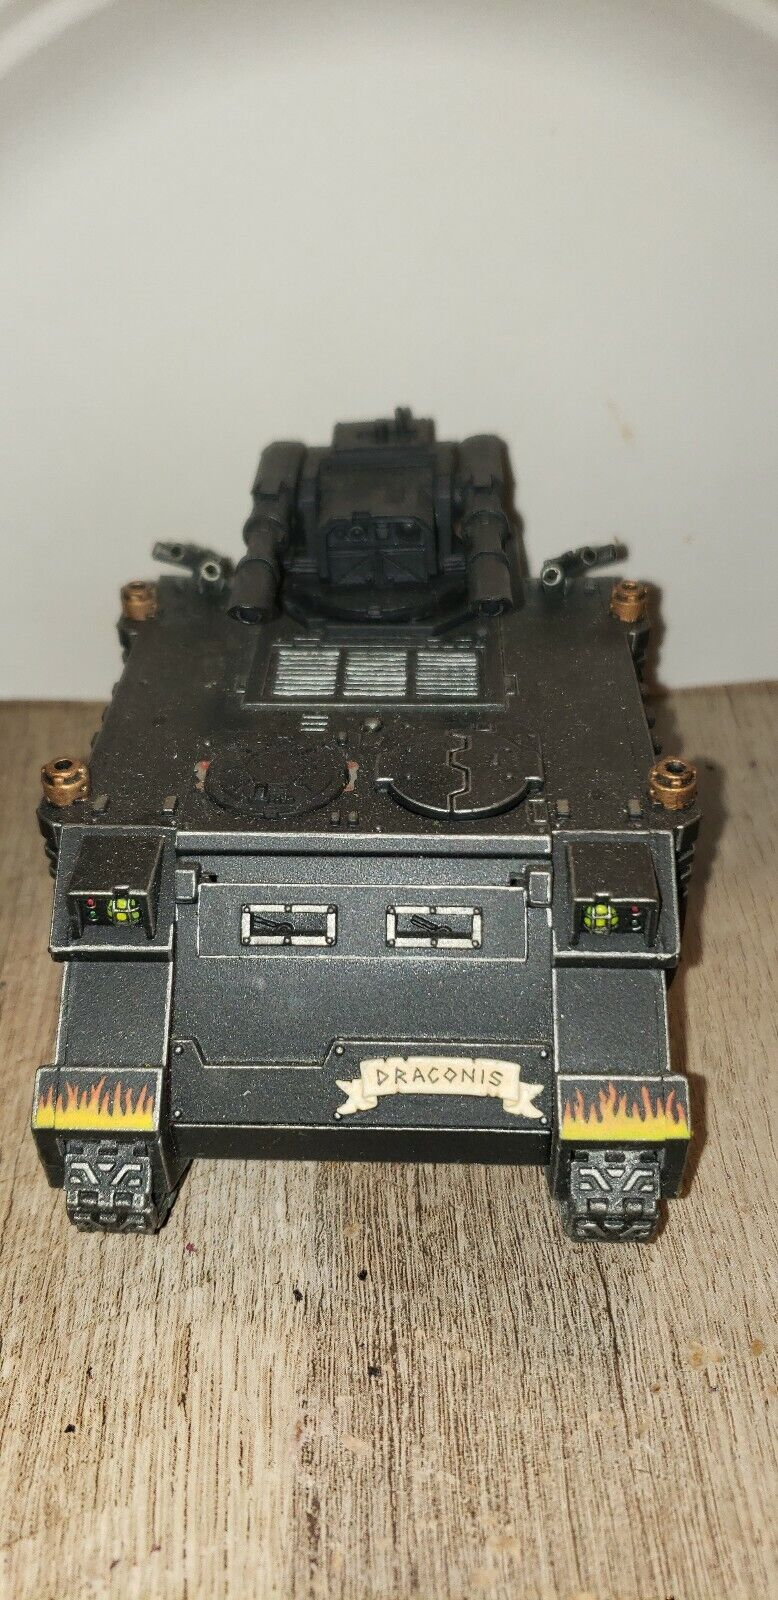 Warhammer 40k space marine Tank